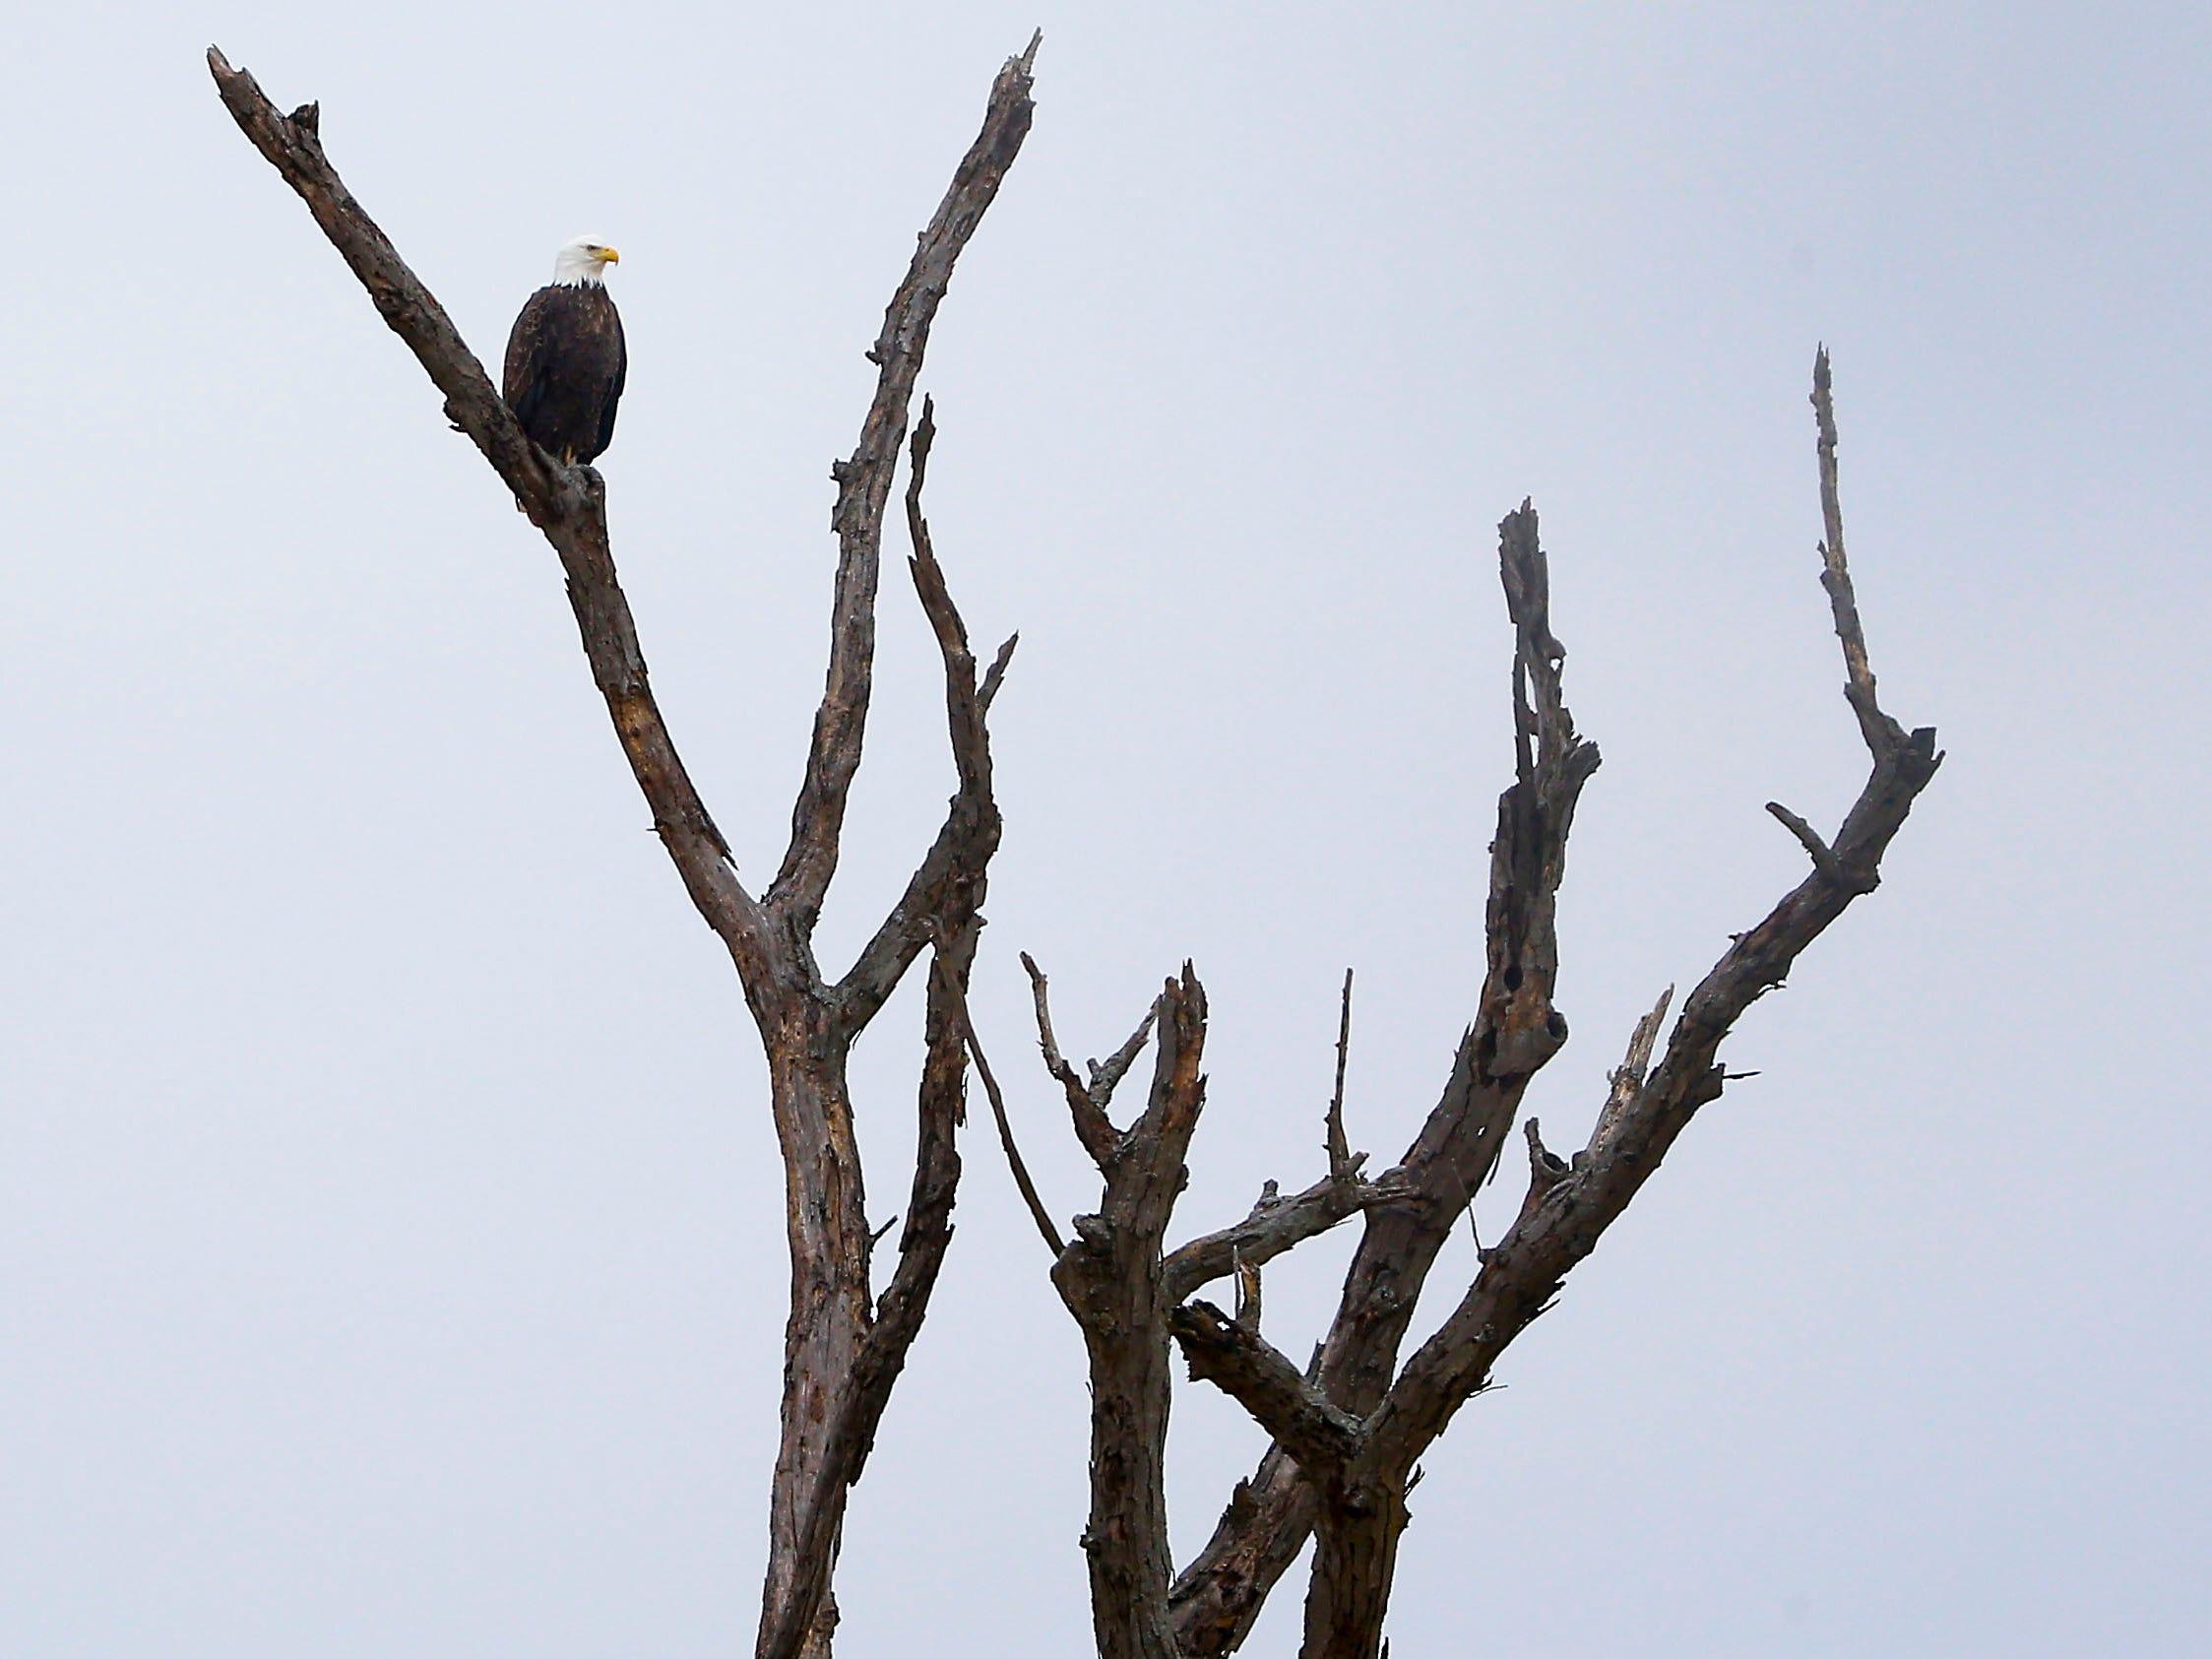 A bald eagle sits perched on a tree near Stella, Mo. on Saturday, Dec. 29, 2018.